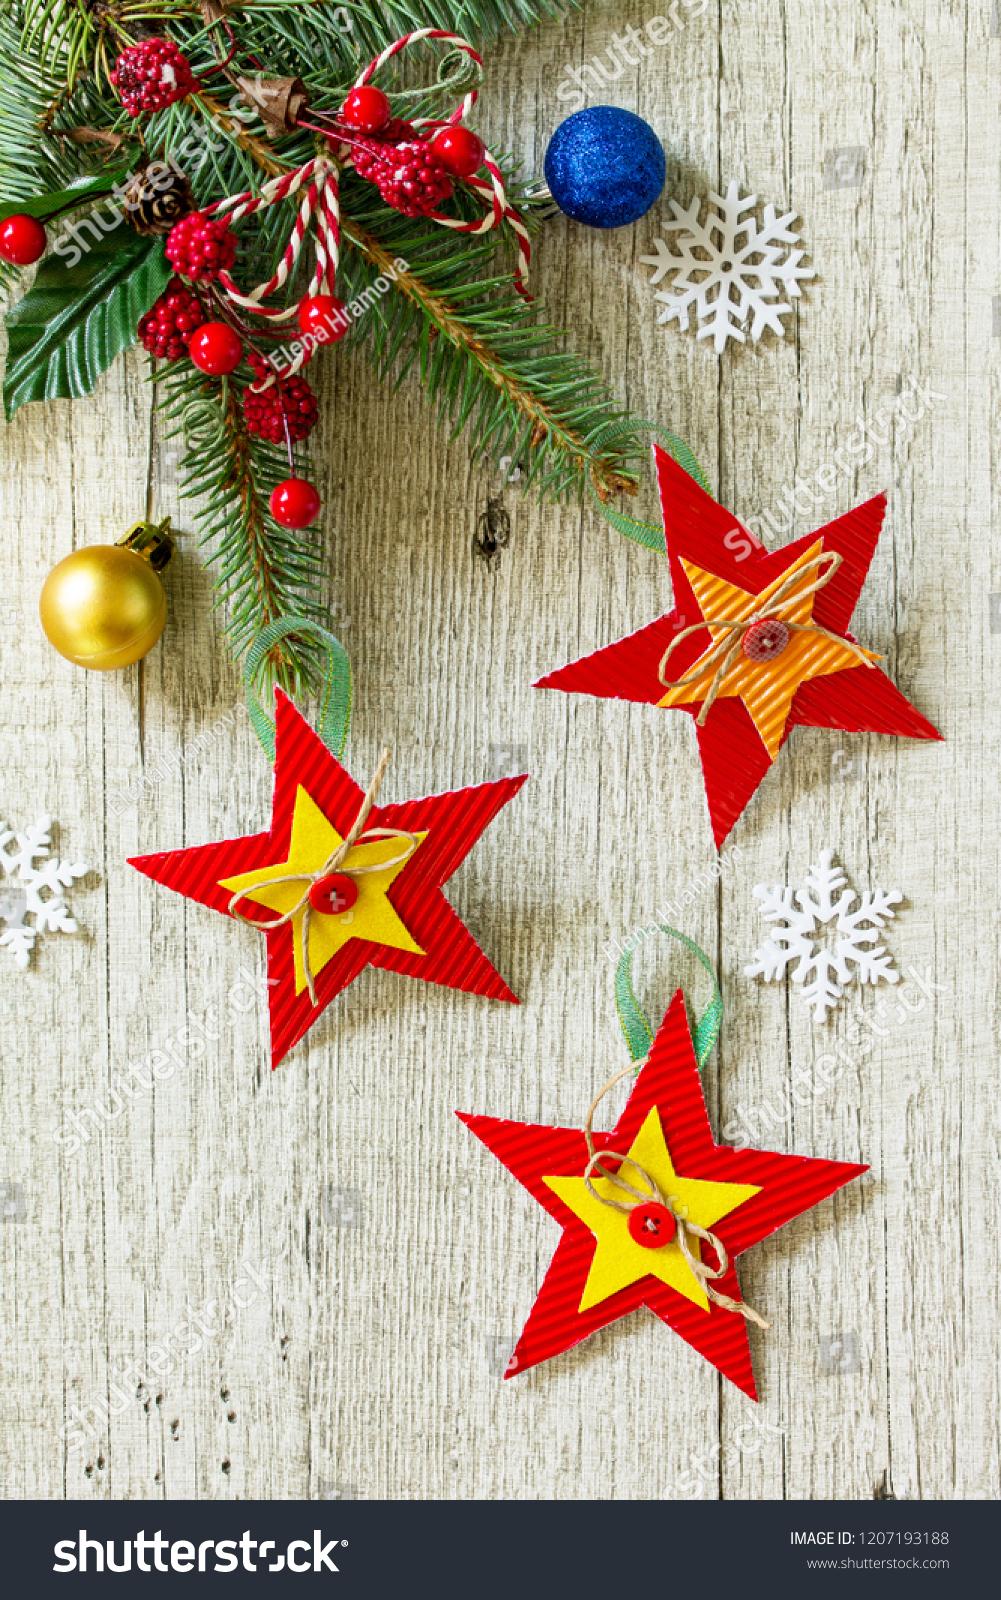 Christmas Gift Christmas Decorations Handmade Paper Stock